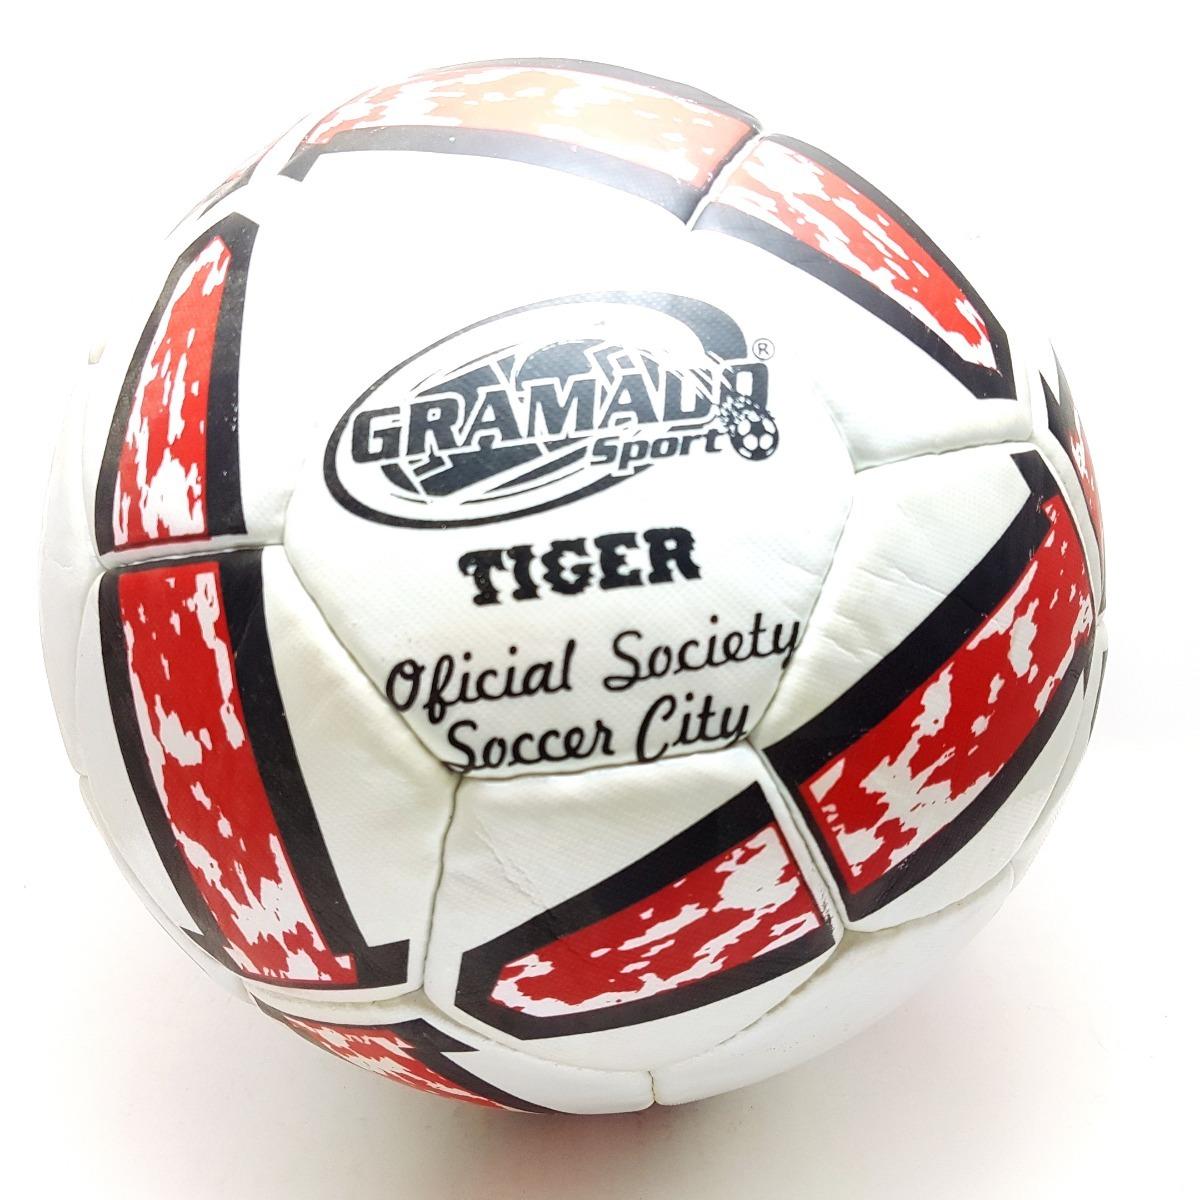 bola gramado sport oficial society tiger oferta black friday. Carregando  zoom. 4032d23dd1a3f